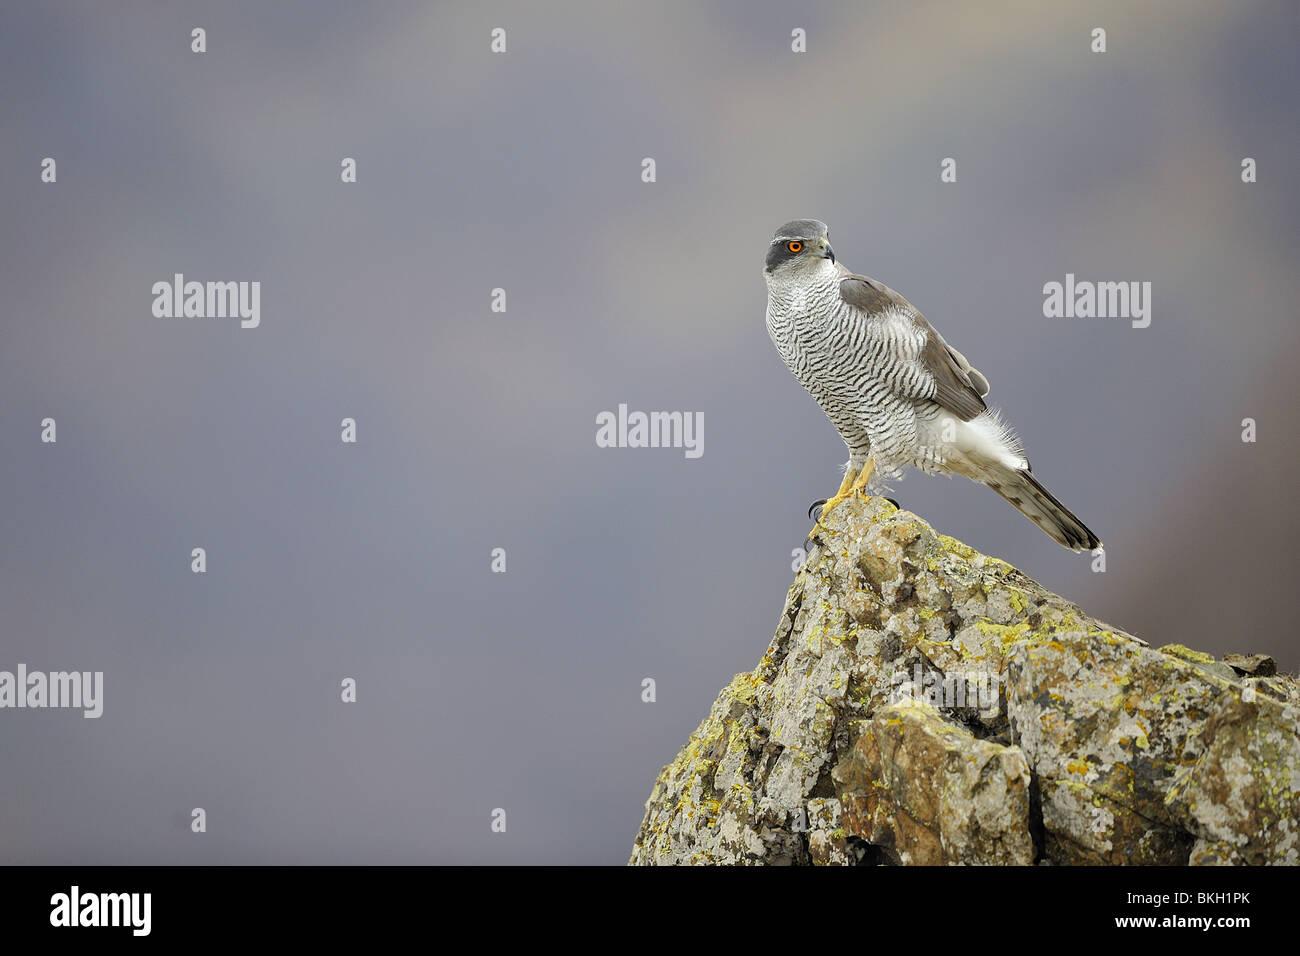 Northern Goshawk standing on rock in winter - Stock Image